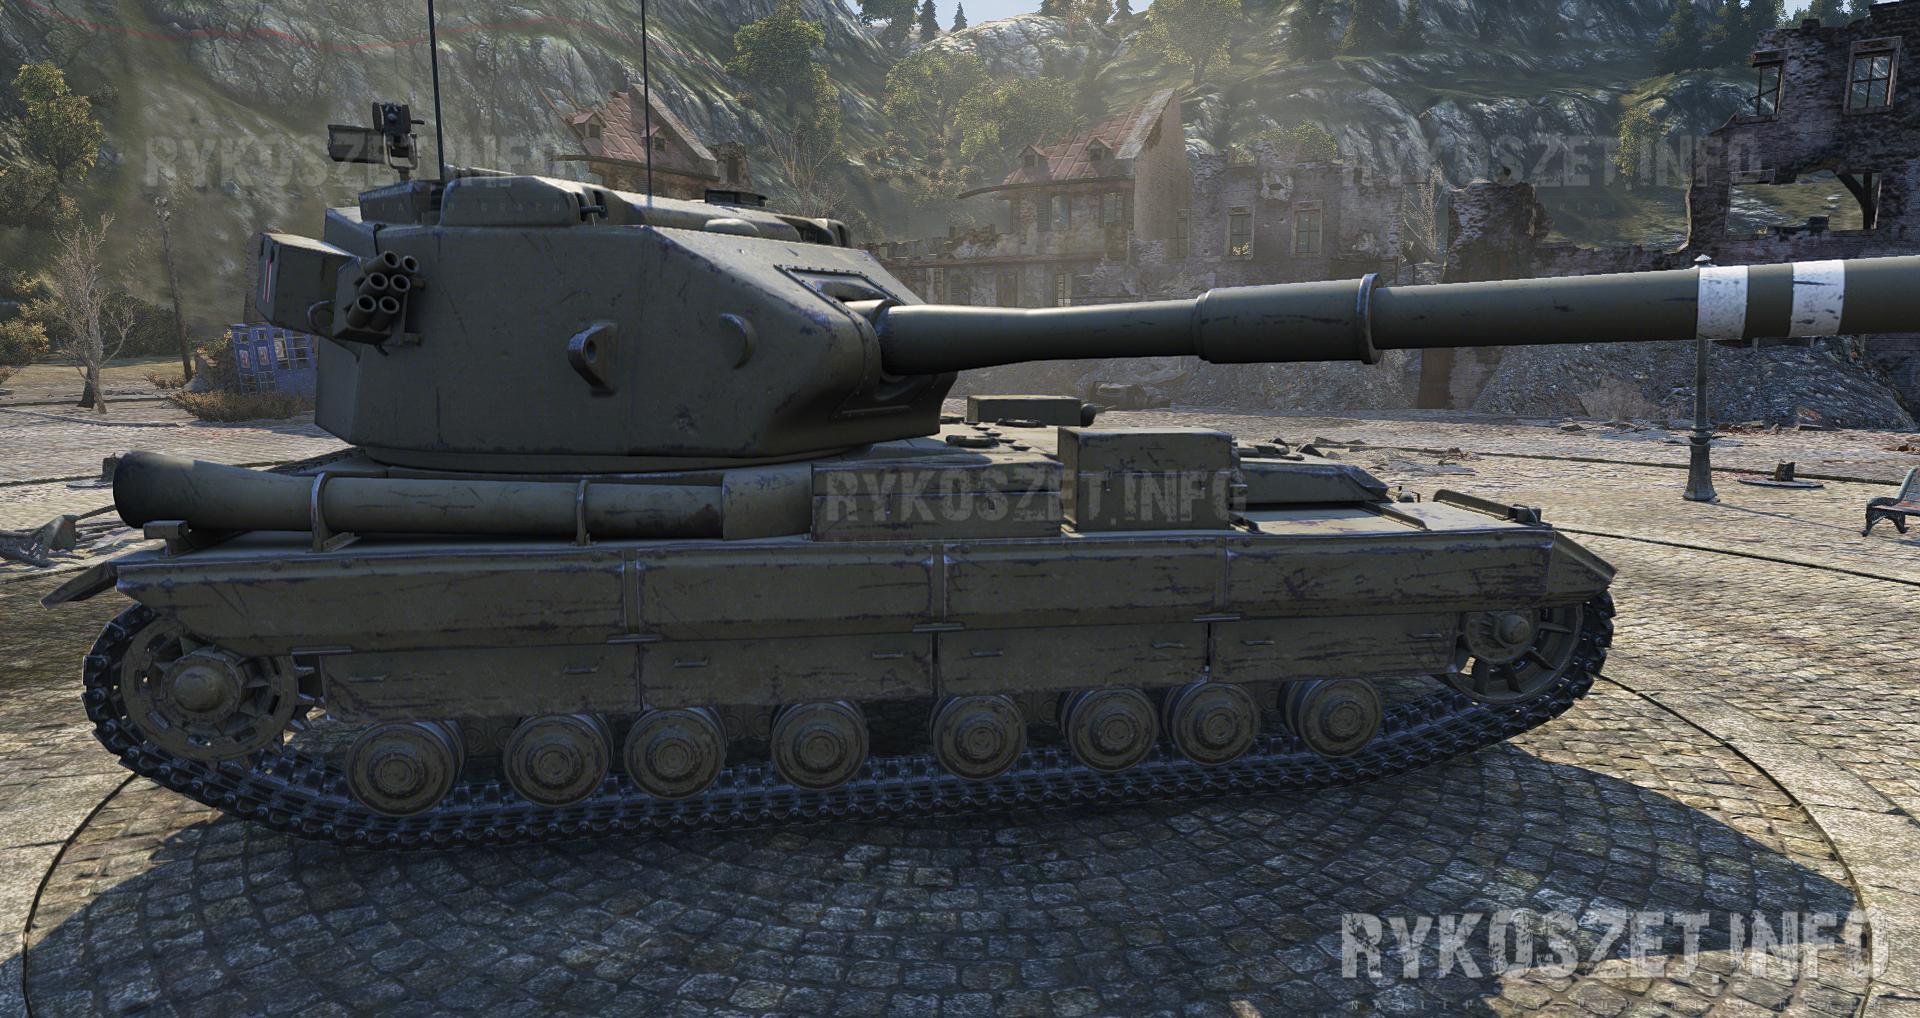 world of tanks day night mod